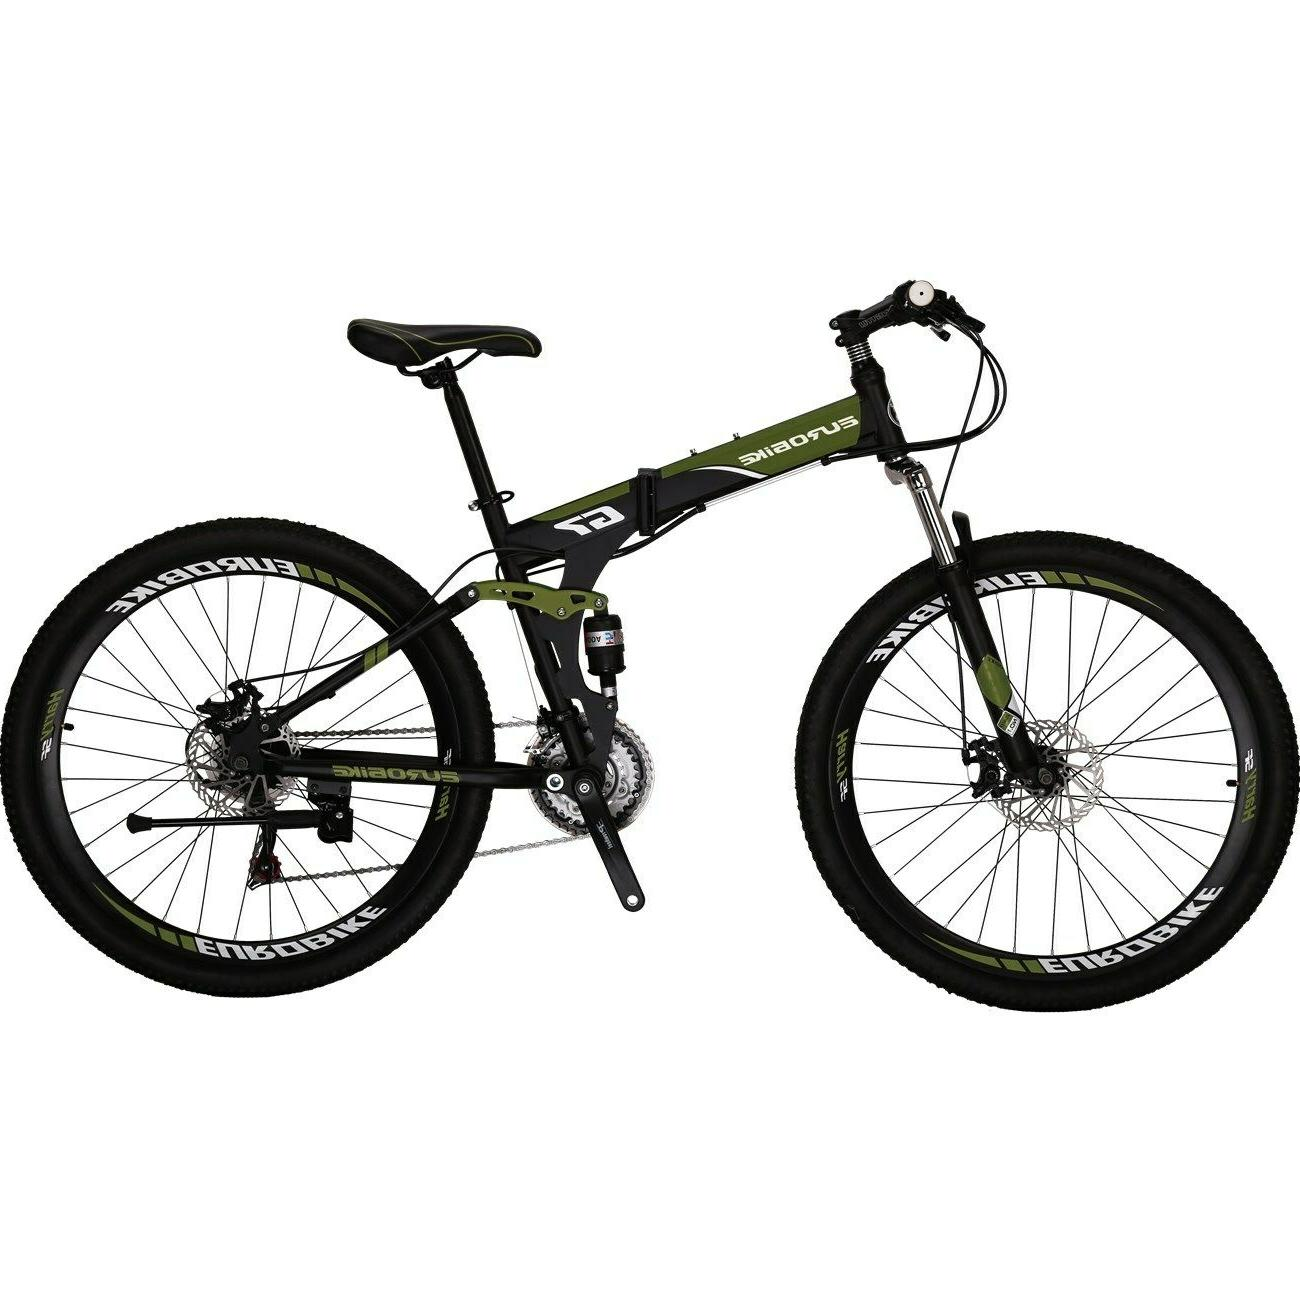 "Eurobike Folding Bike 21 27.5"" Mens Brake"